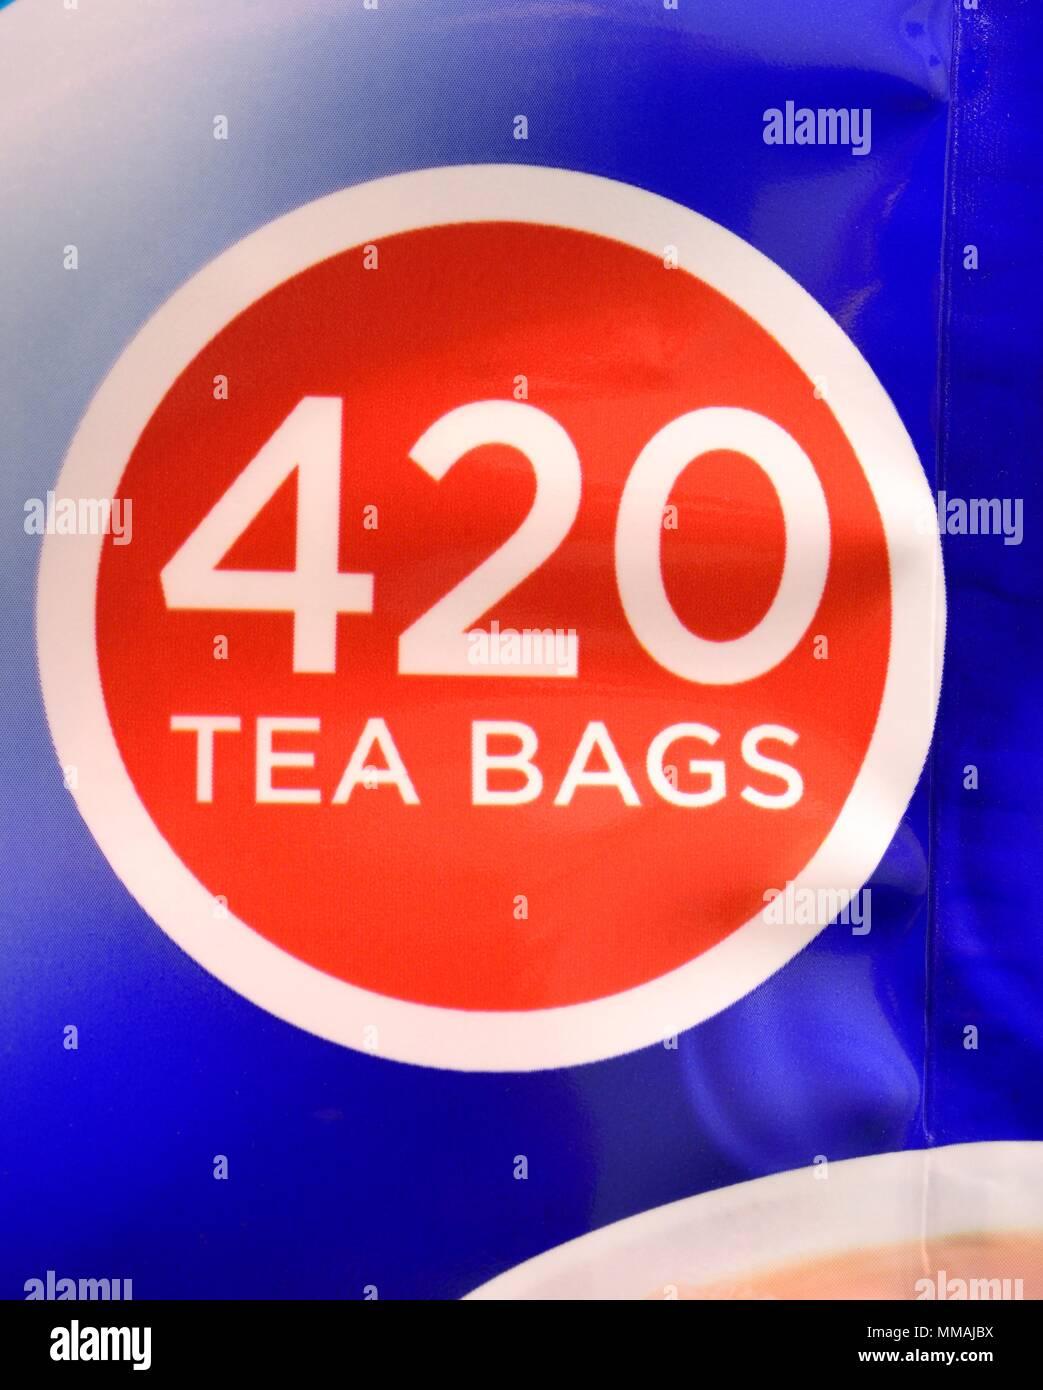 Tetley tea bags 420 pack - Stock Image